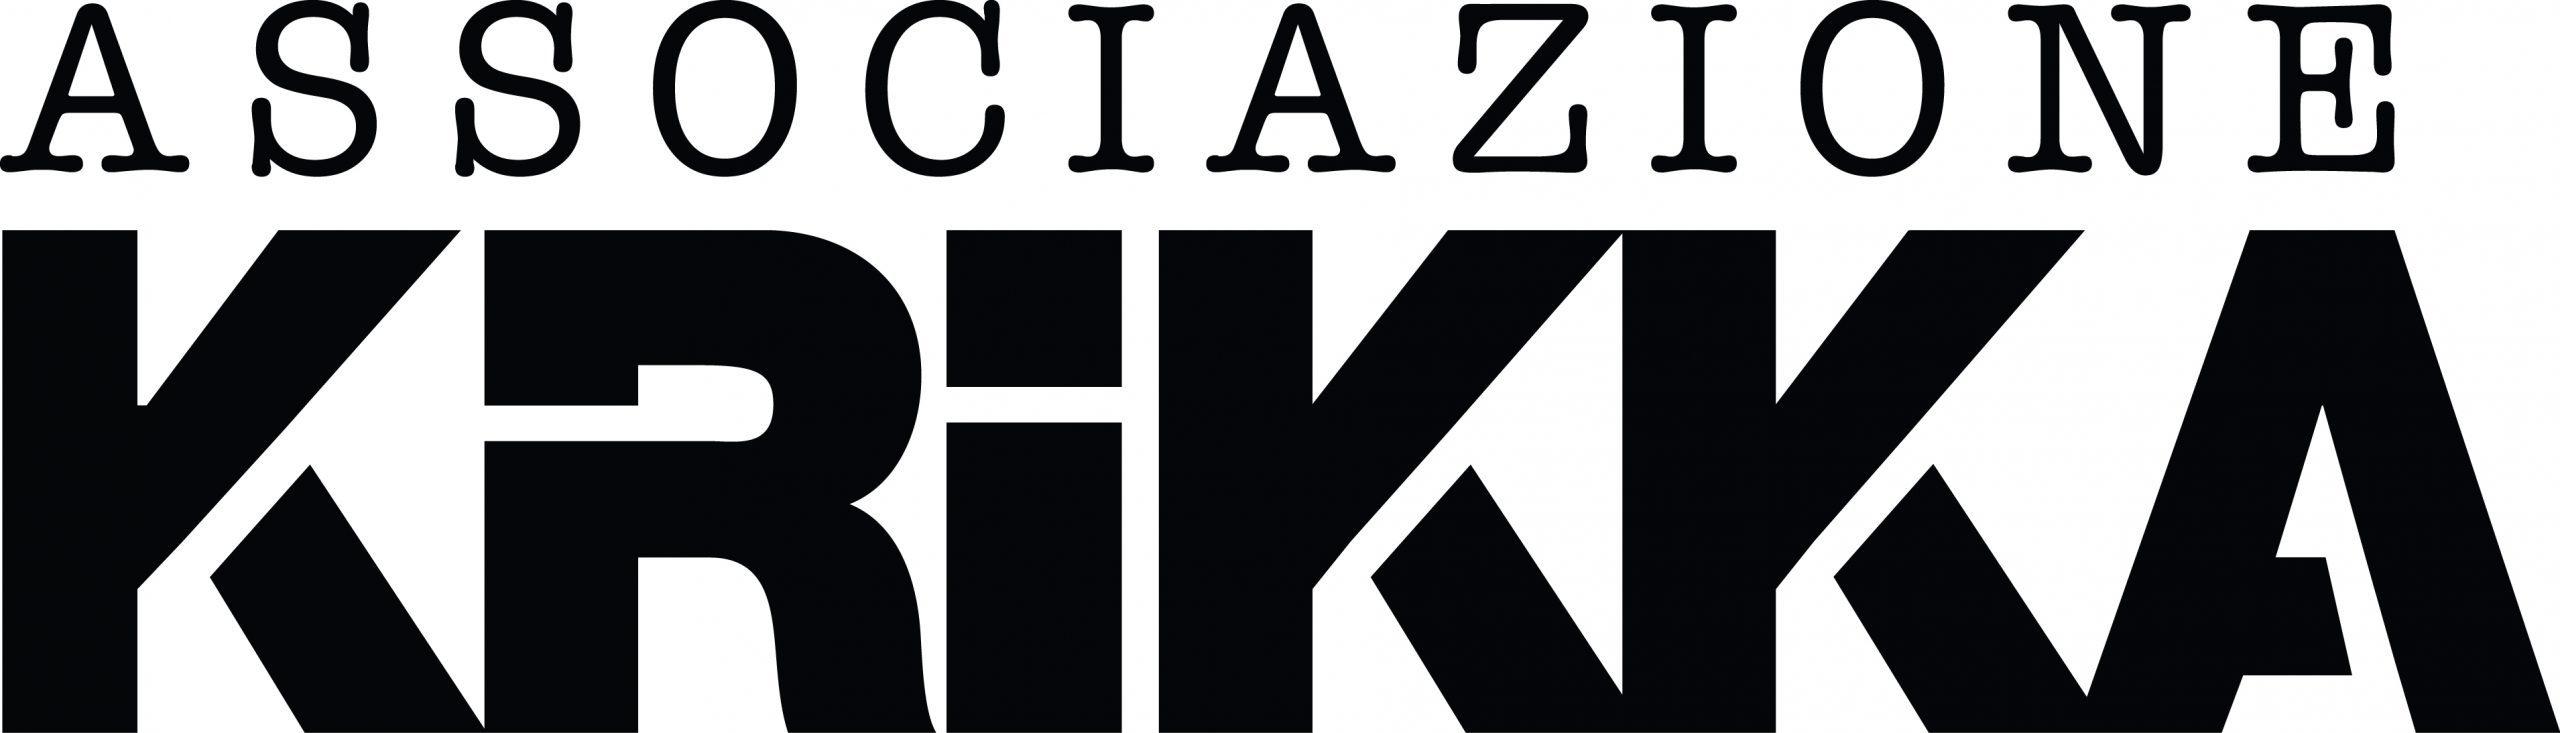 associazione krikka